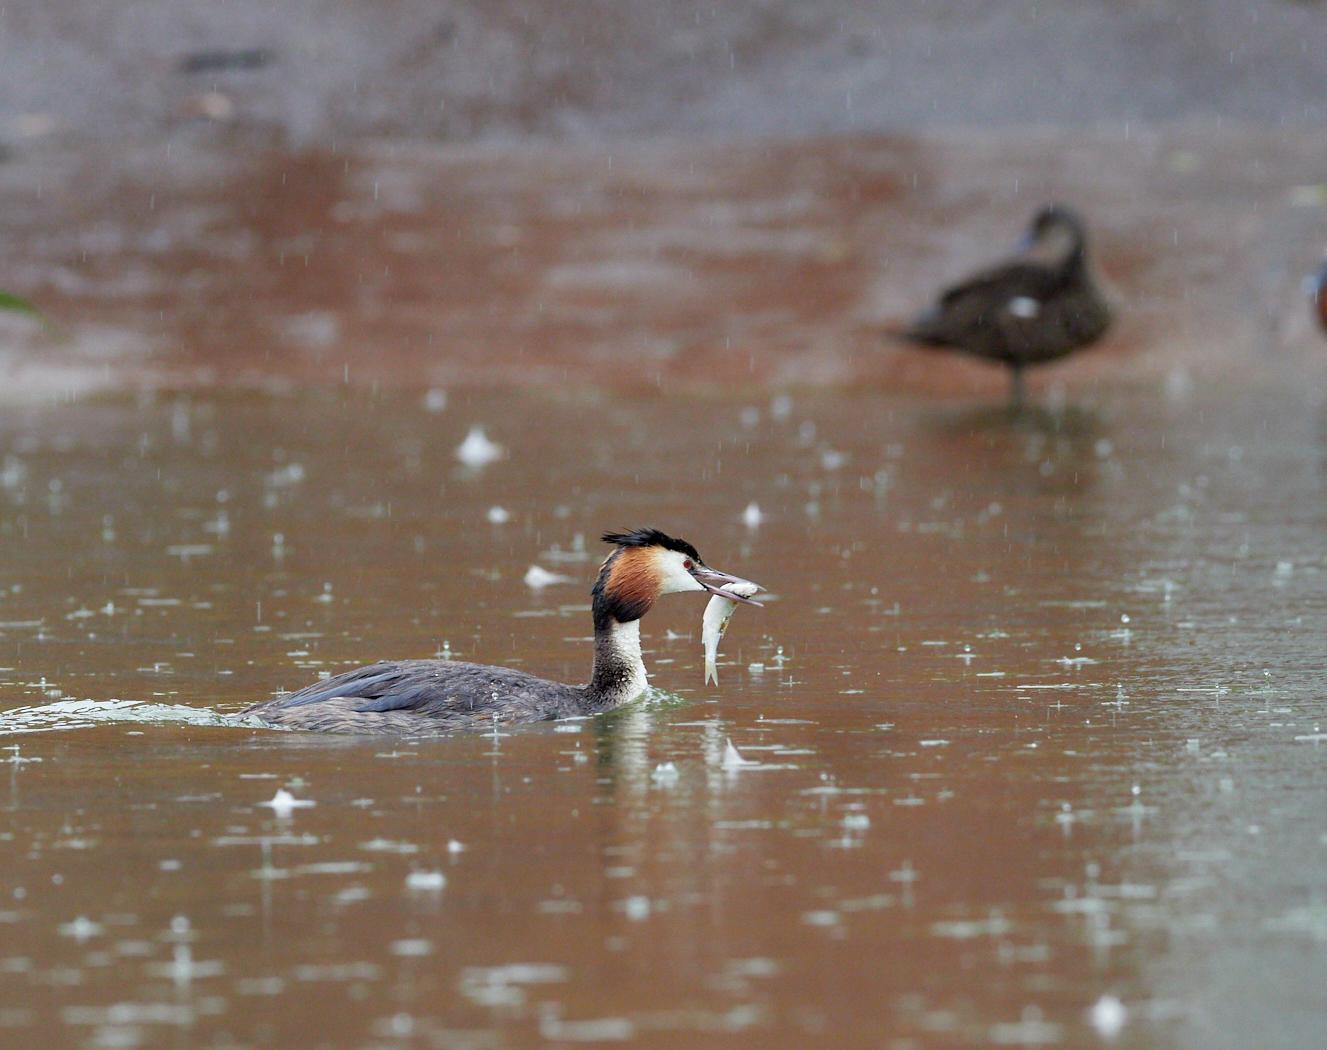 Grebe and fish in the rain1400x1050 sRGB.jpg